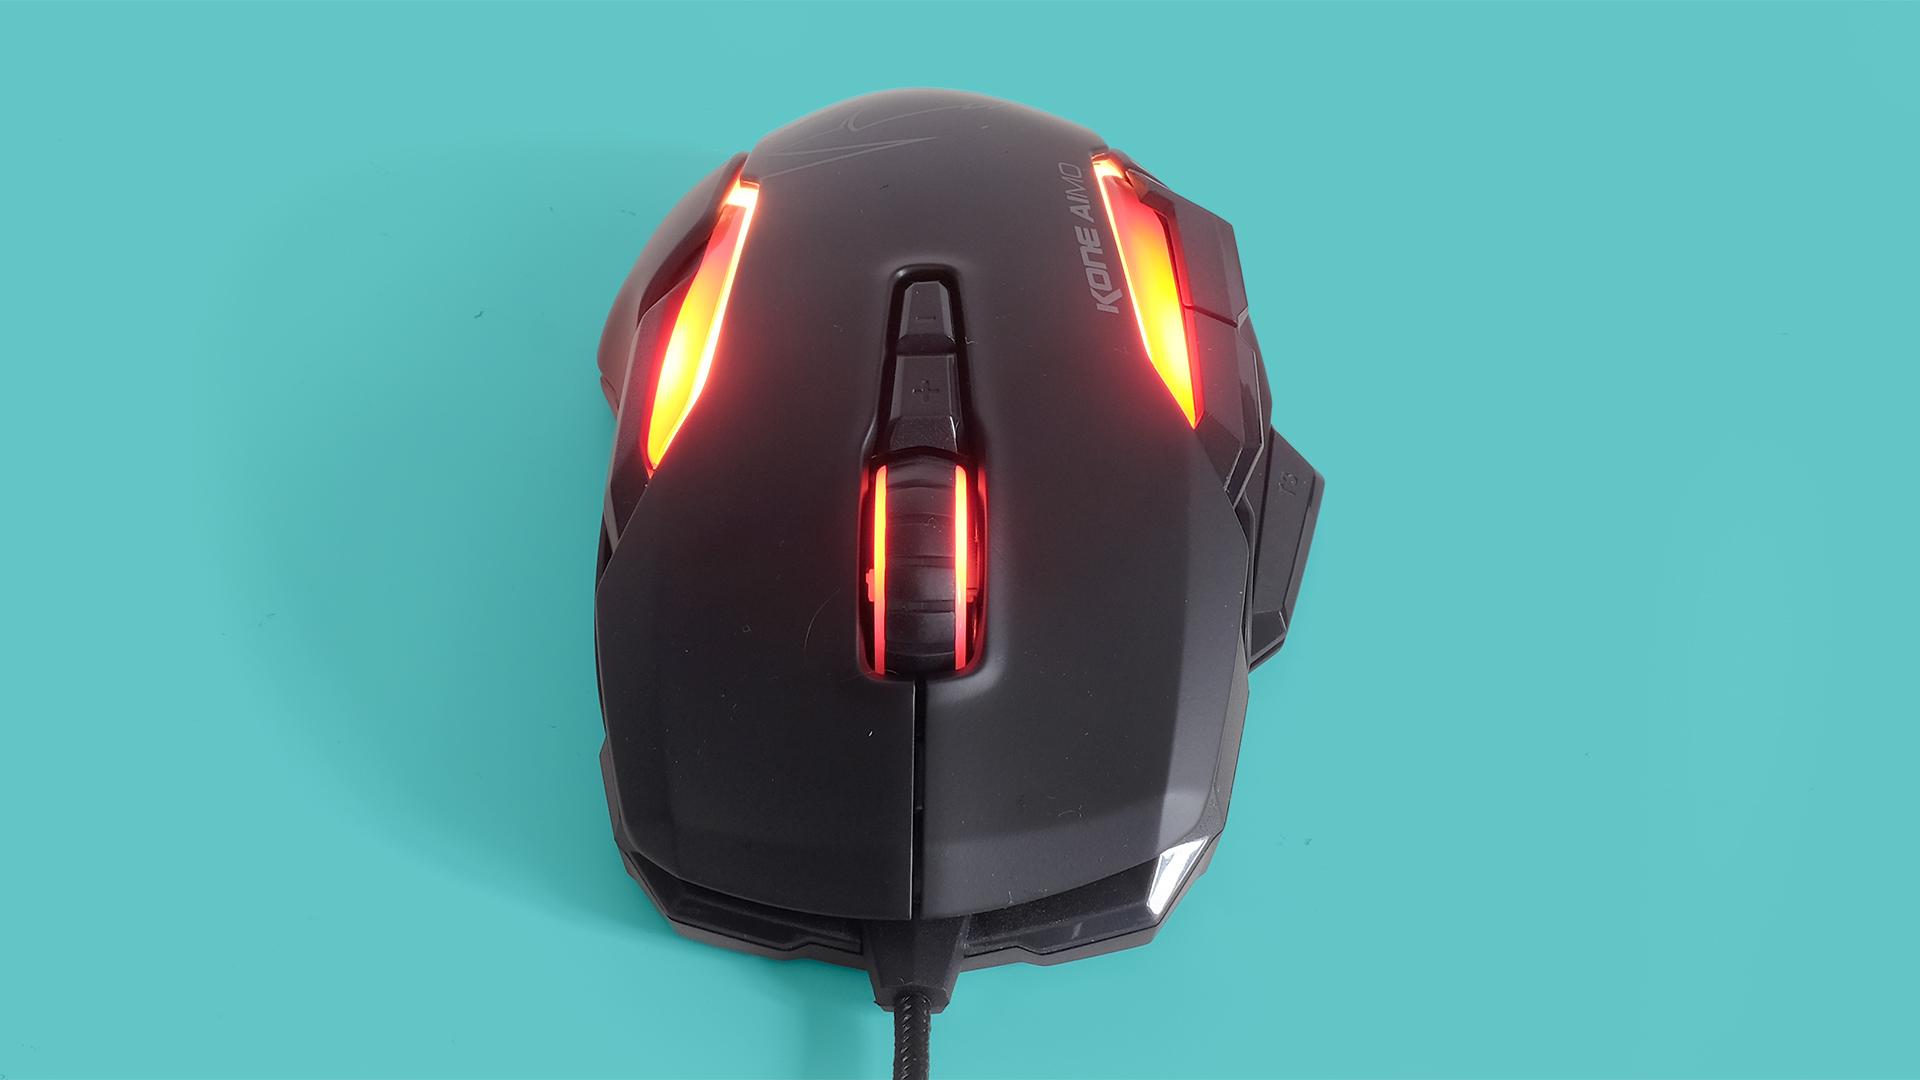 Roccat Kone Aimo Gadgetflow Razer Naga Chroma Gaming Mouse Kode Mosx 14 App Configuration